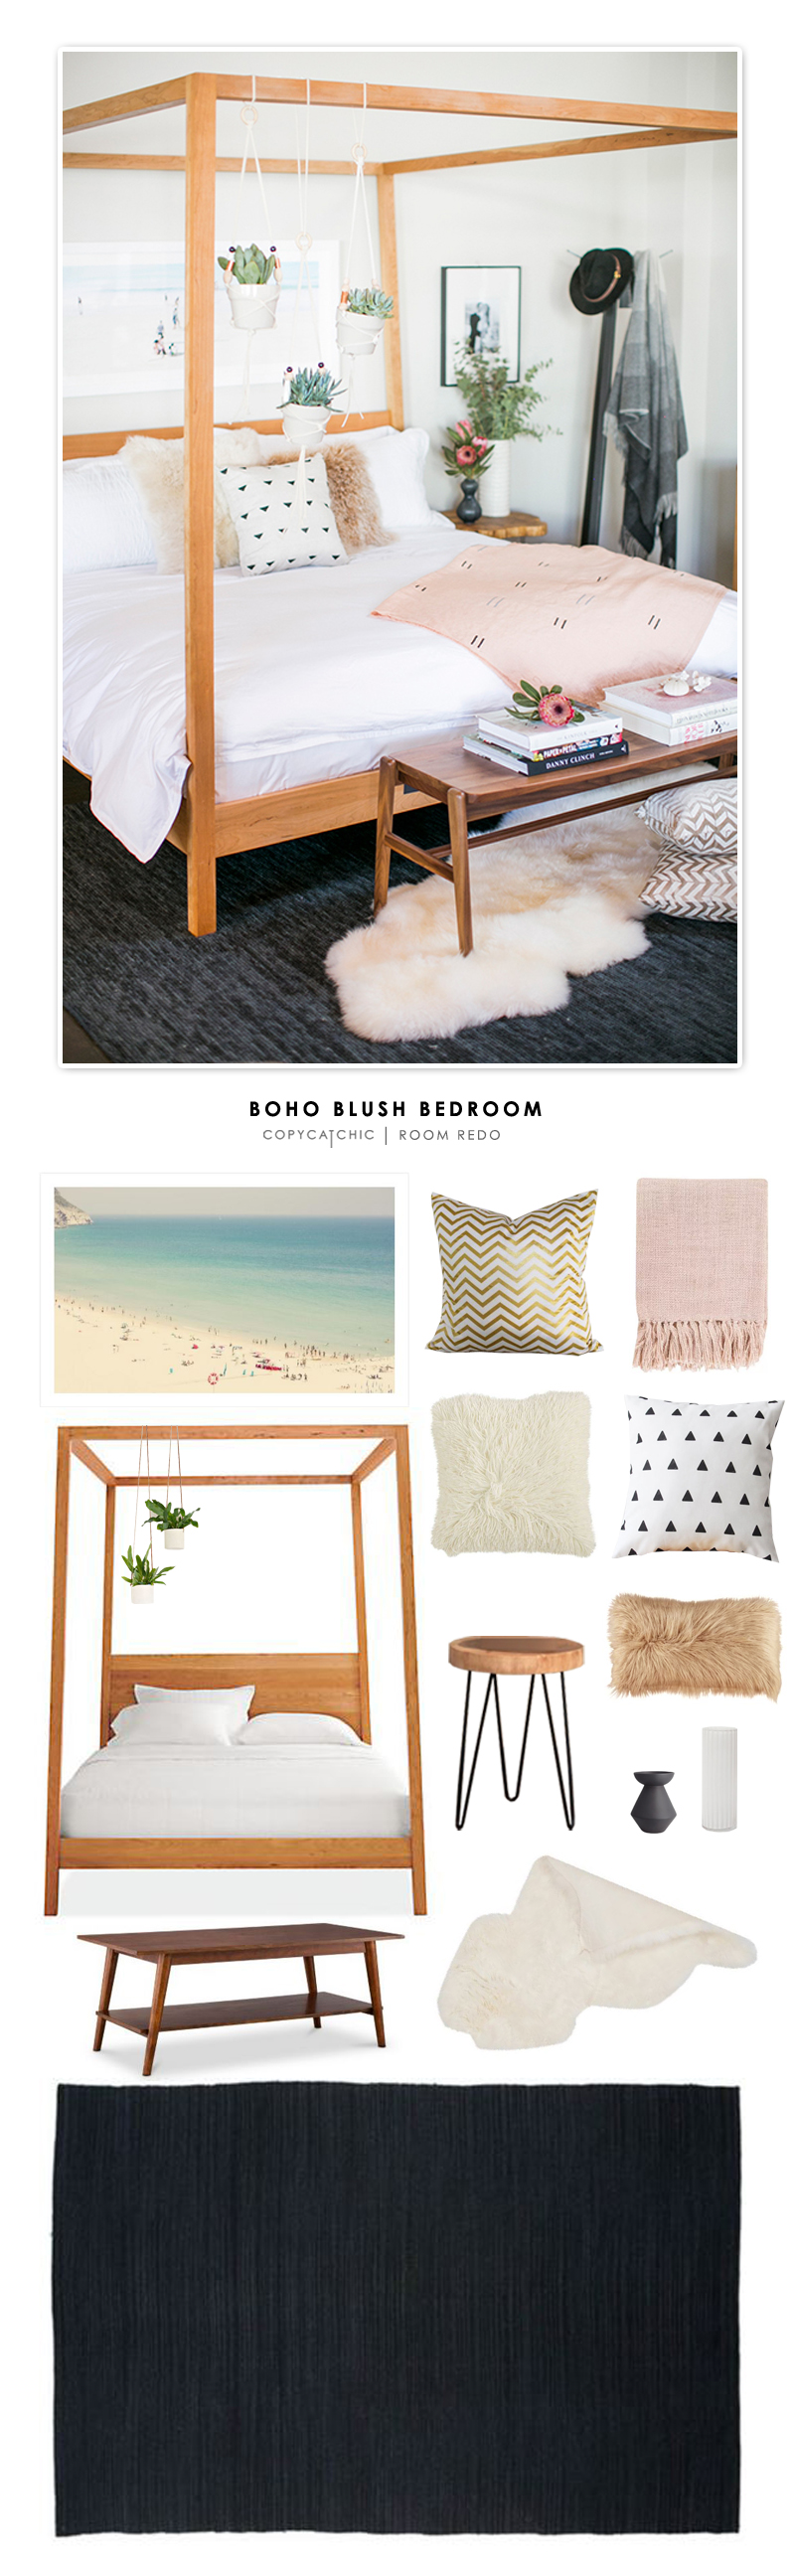 Copy Cat Chic Room Redo | Rose Quartz Bedroom - copycatchic